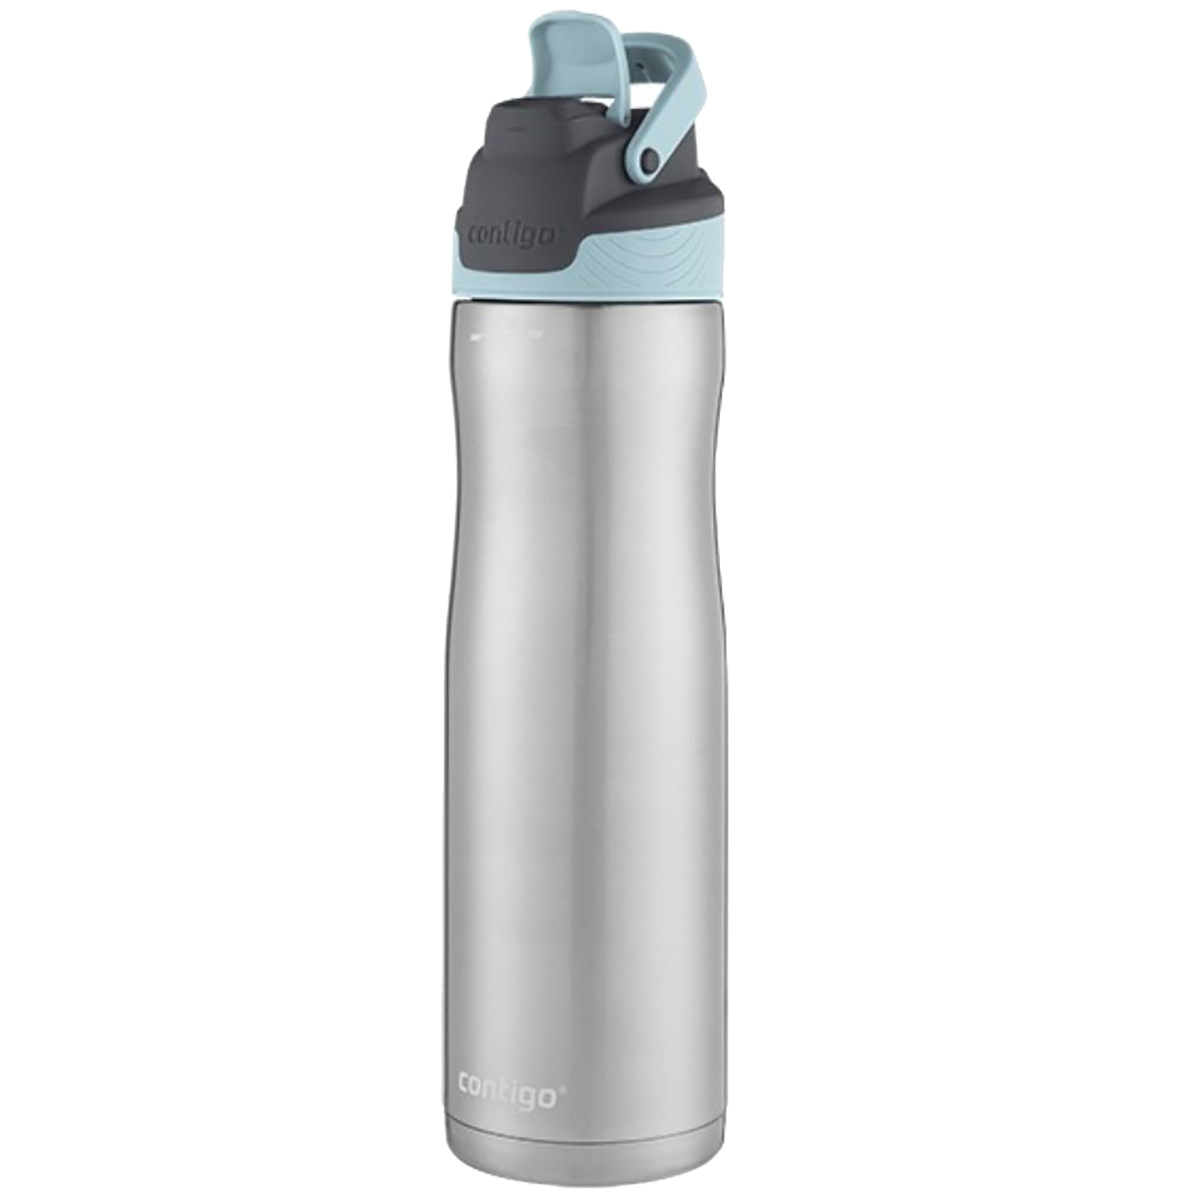 Contigo-24-oz-Chill-Autoseal-Stainless-Steel-Water-Bottle thumbnail 11